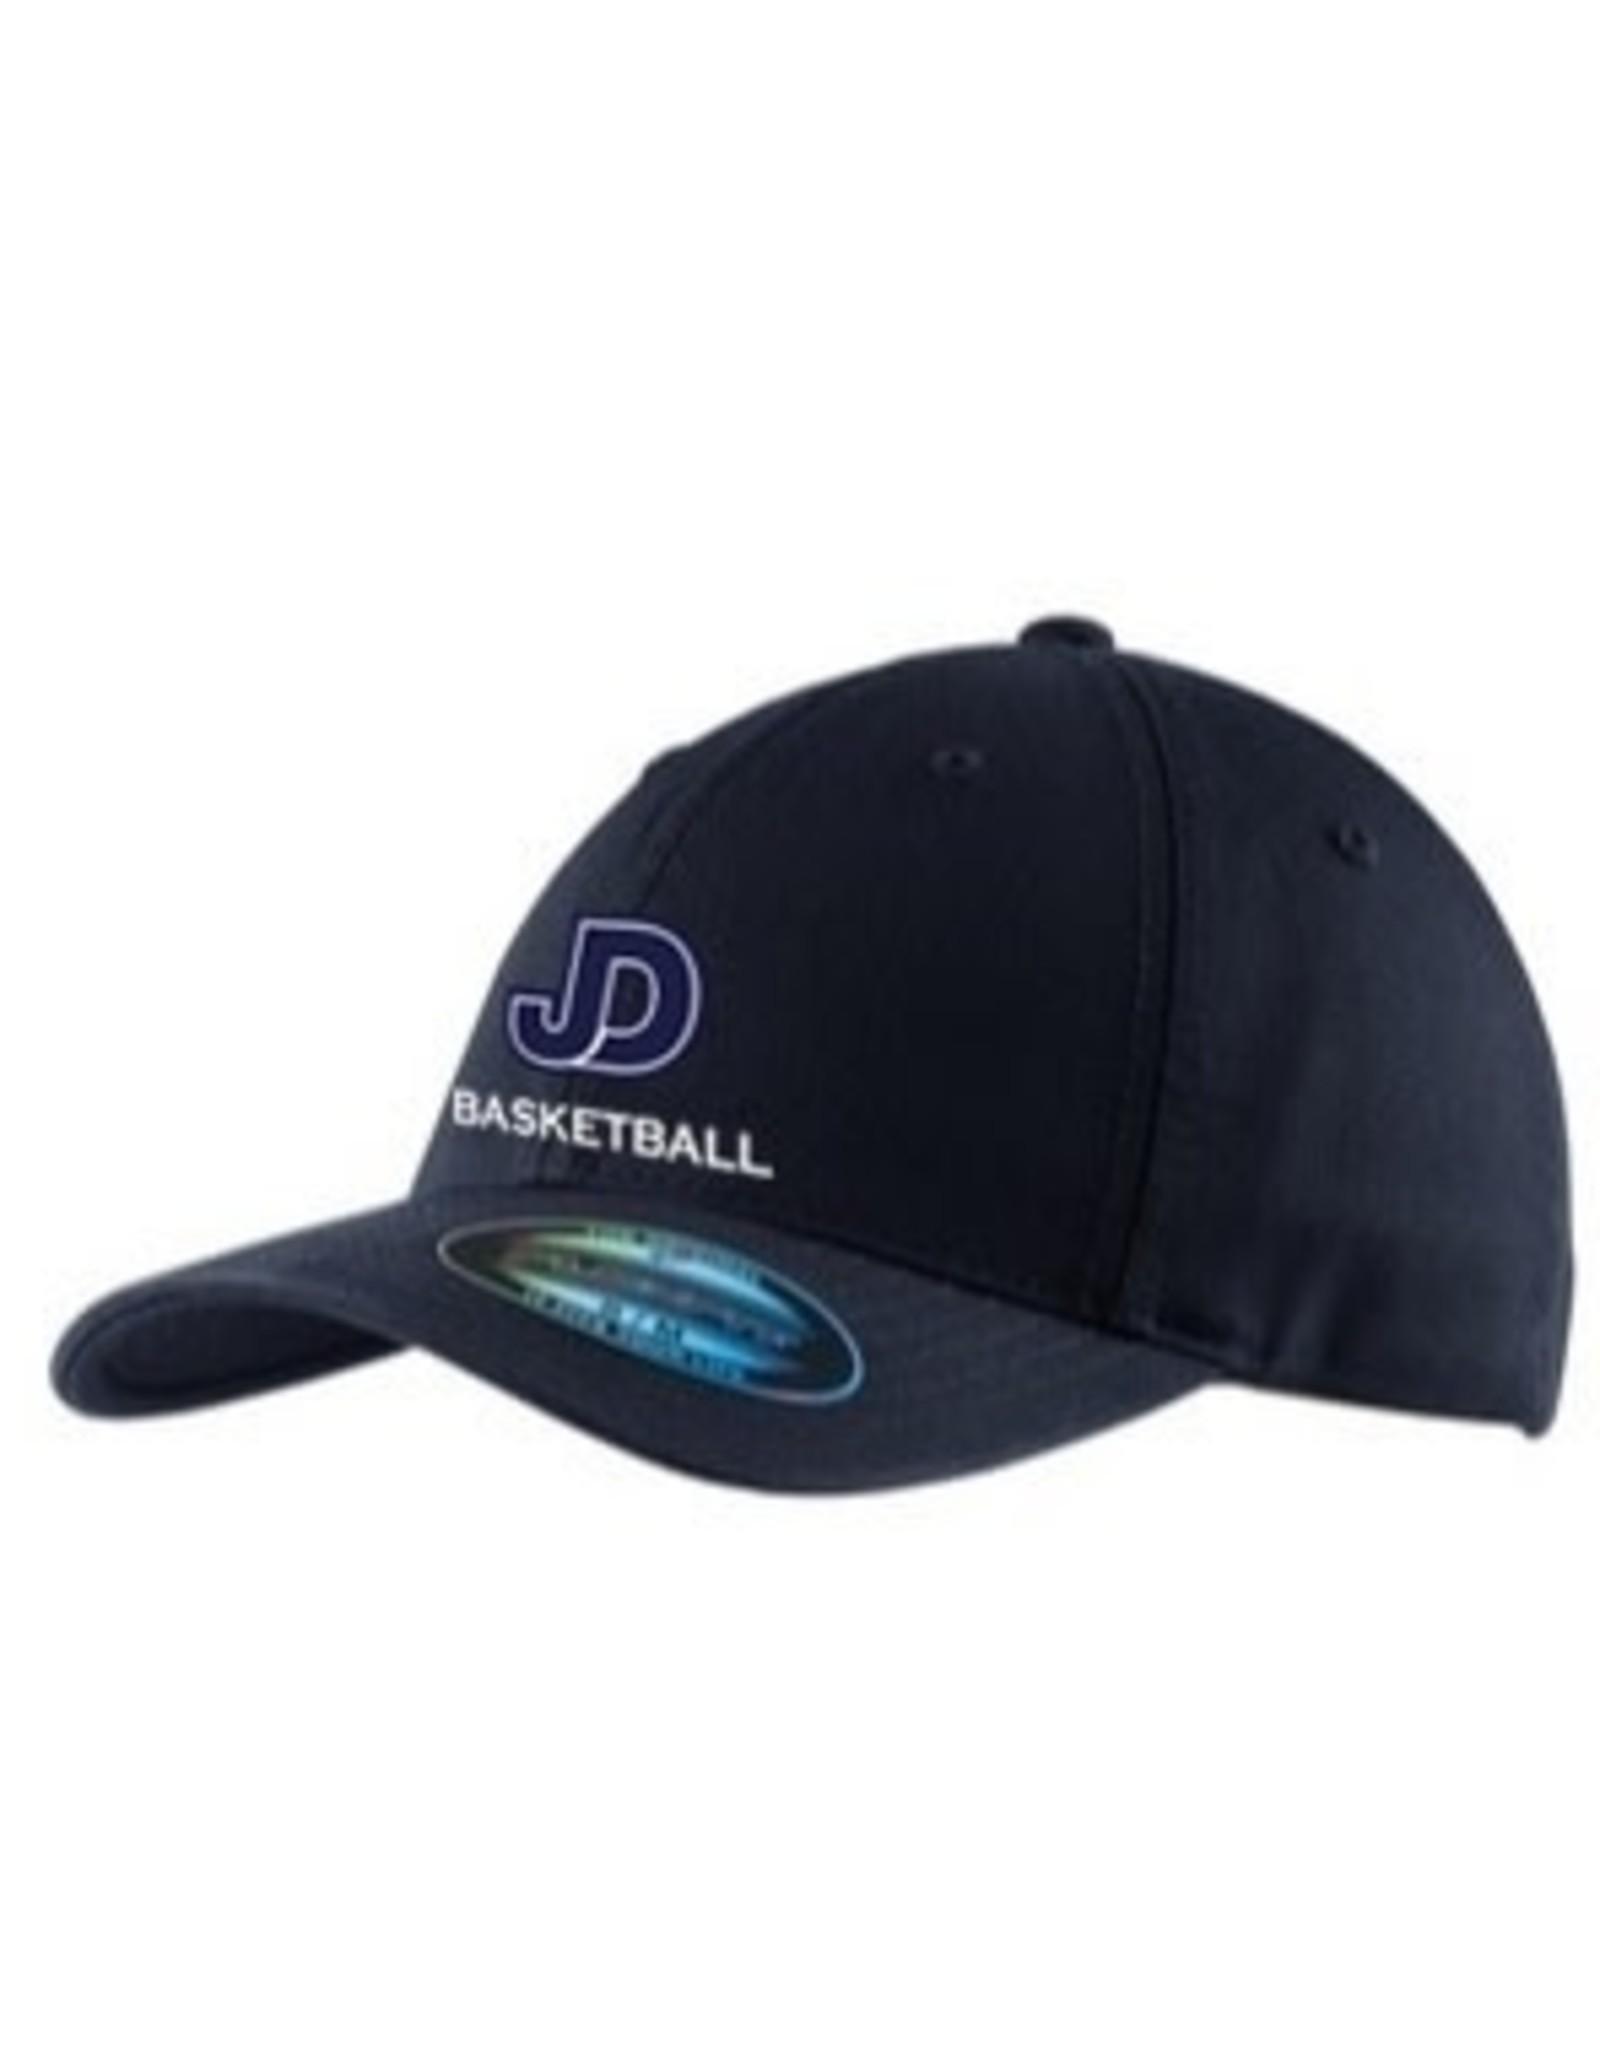 NON-UNIFORM Boys Basketball navy embroidered hat